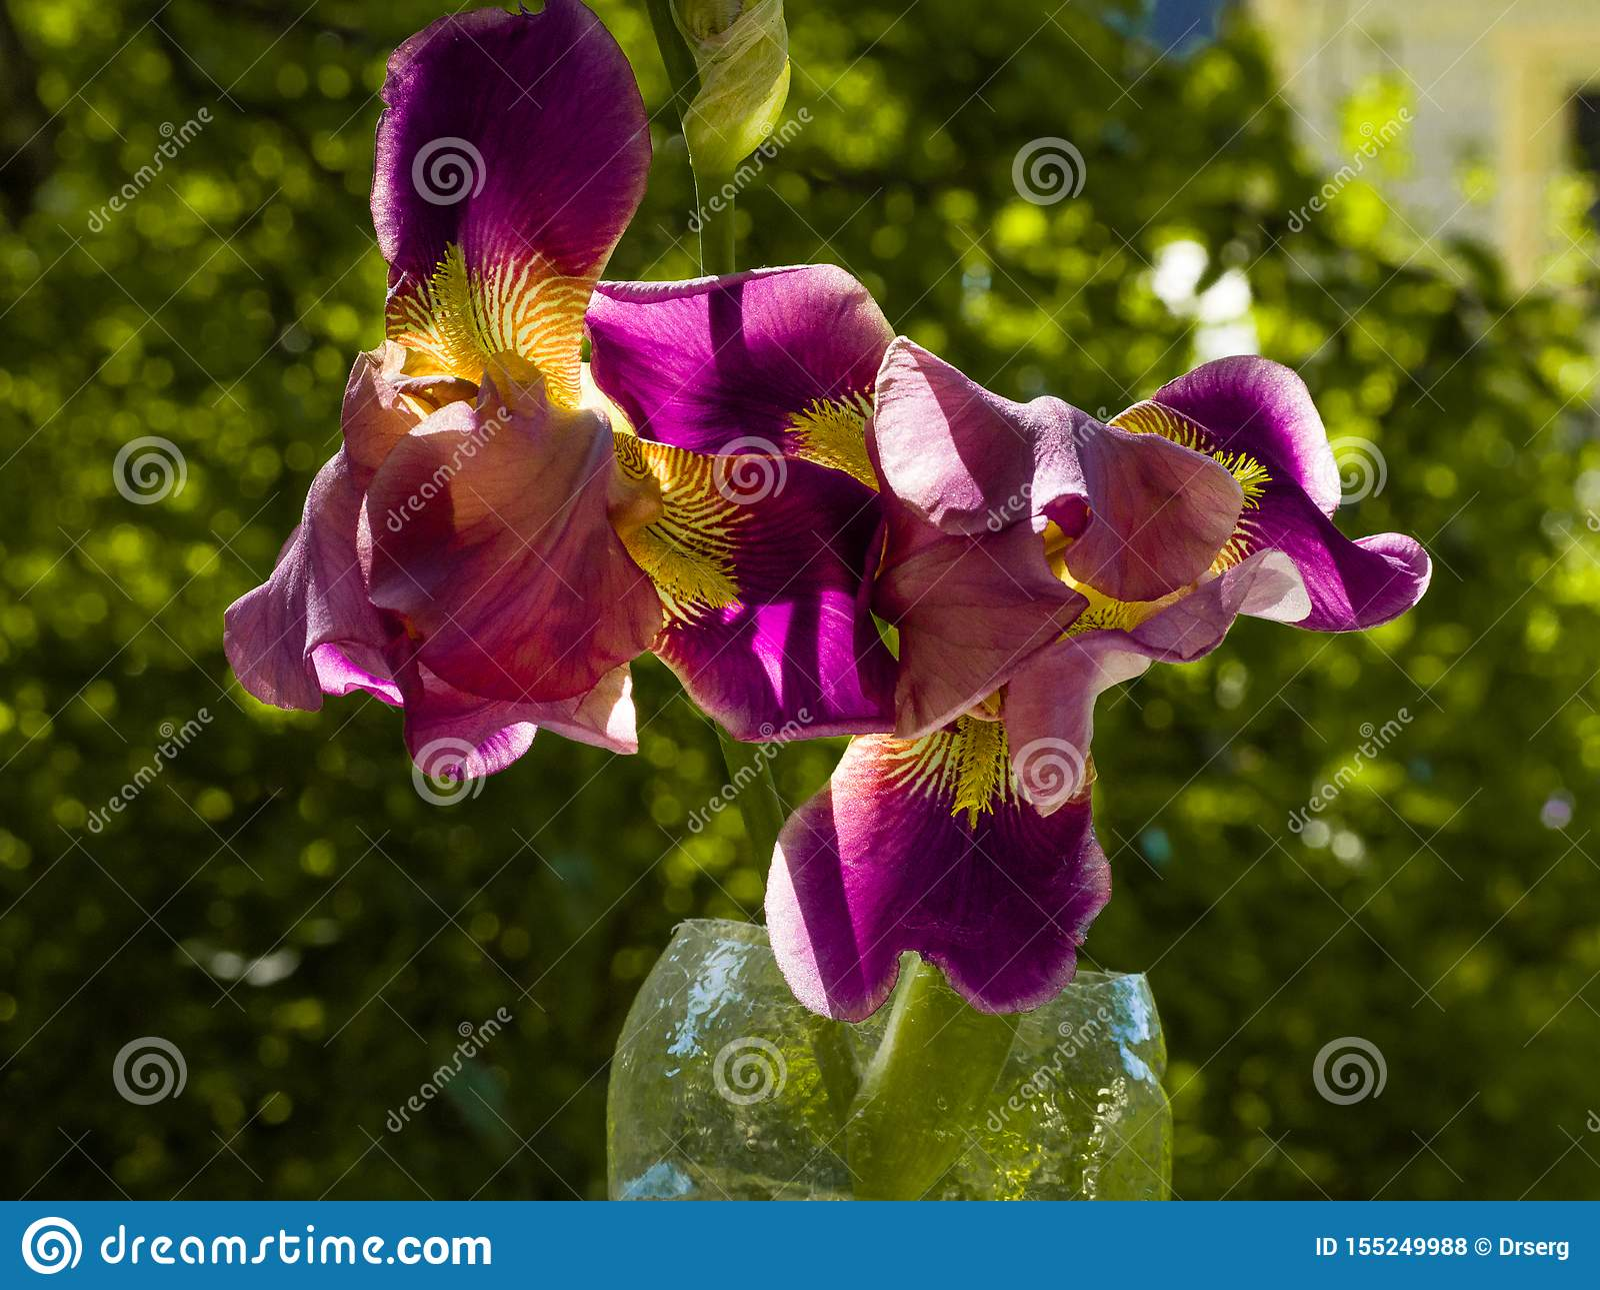 Purple and yellow bearded iris flower in bloom on dark green blurred bokeh background